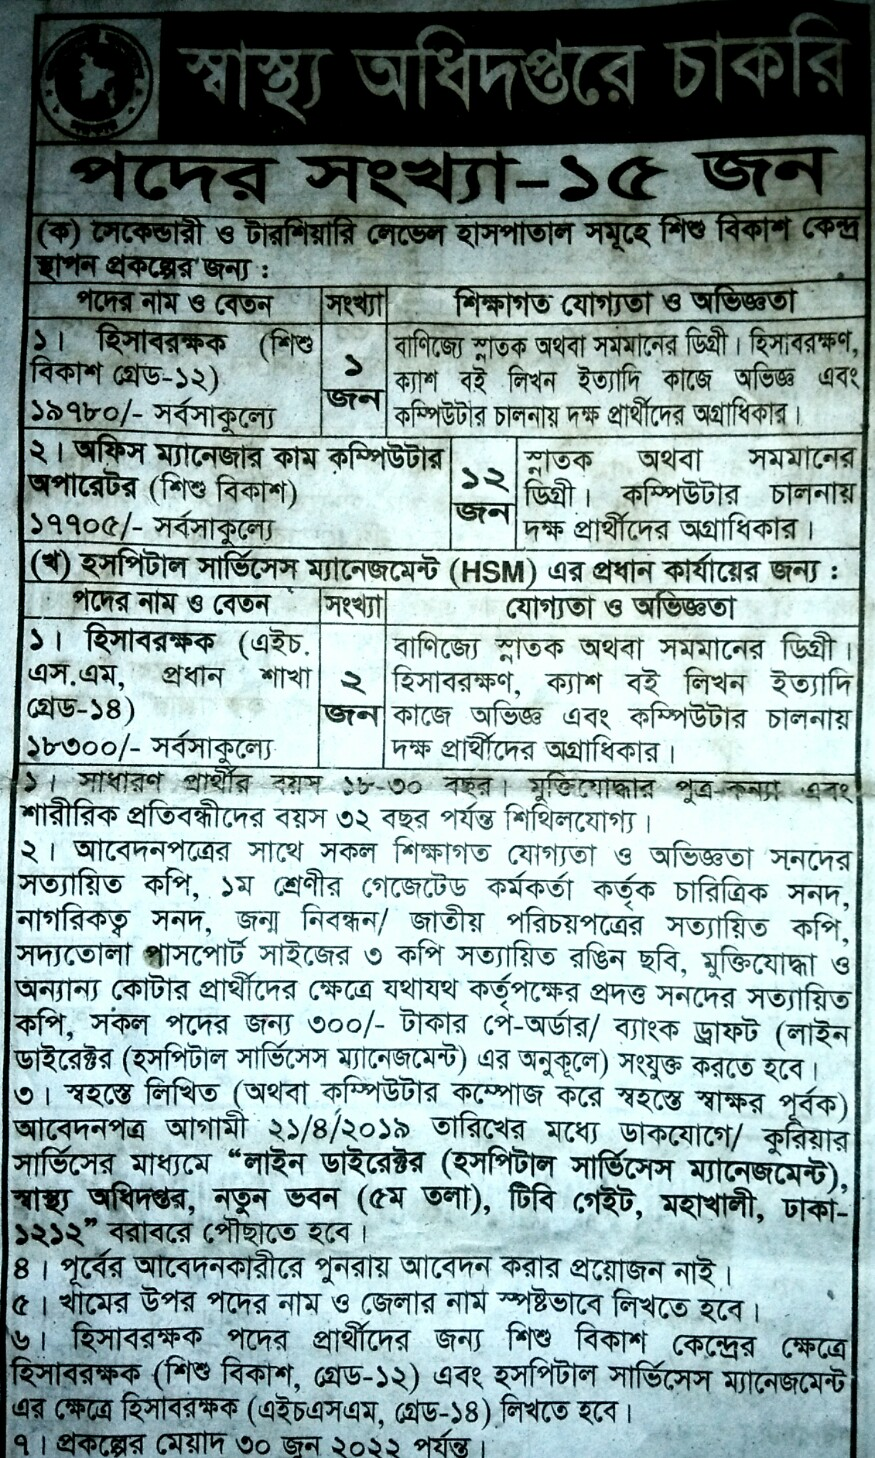 Directorate of health job circular 2019. স্বাস্থ্য অধিদপ্তরে নিয়োগ বিজ্ঞপ্তি ২০১৯